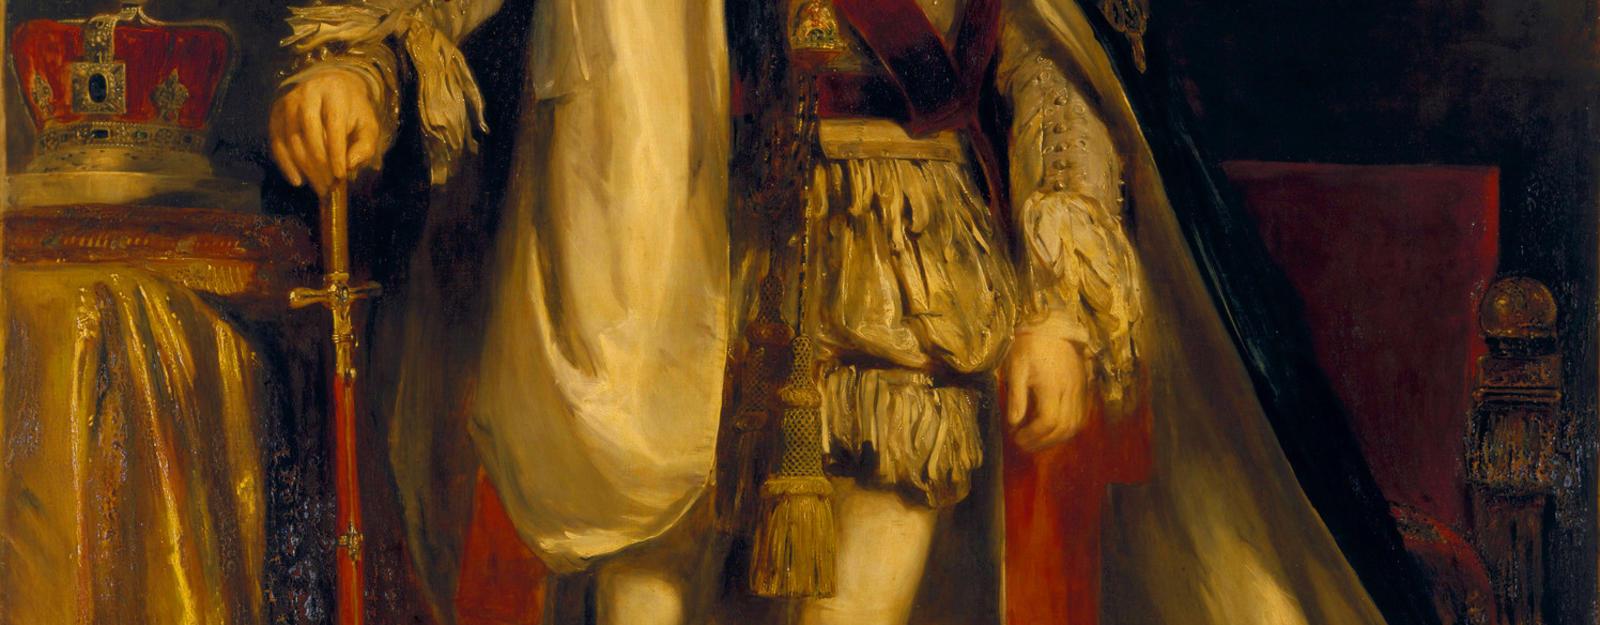 Portrait of William IV in Garter Robes